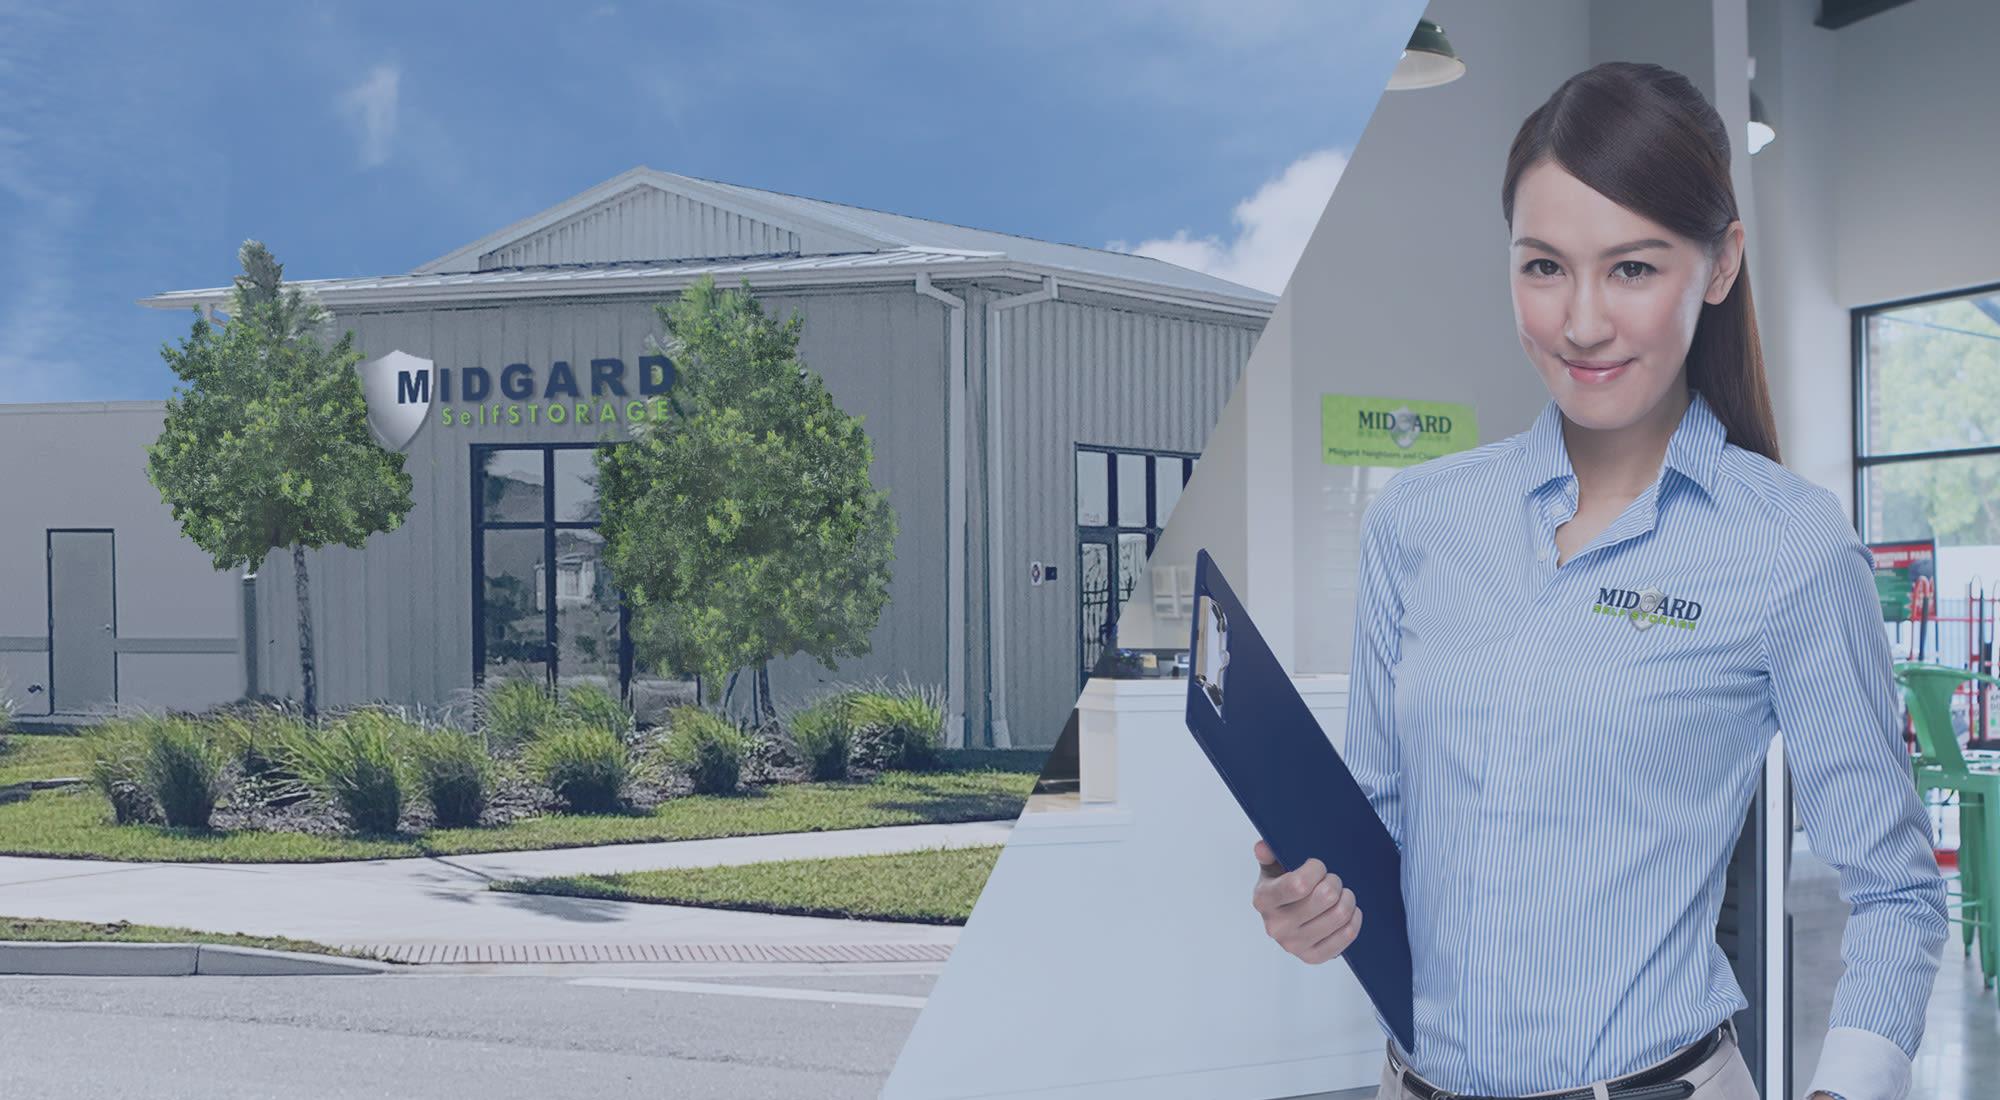 Midgard Self Storage in Bradenton, Florida